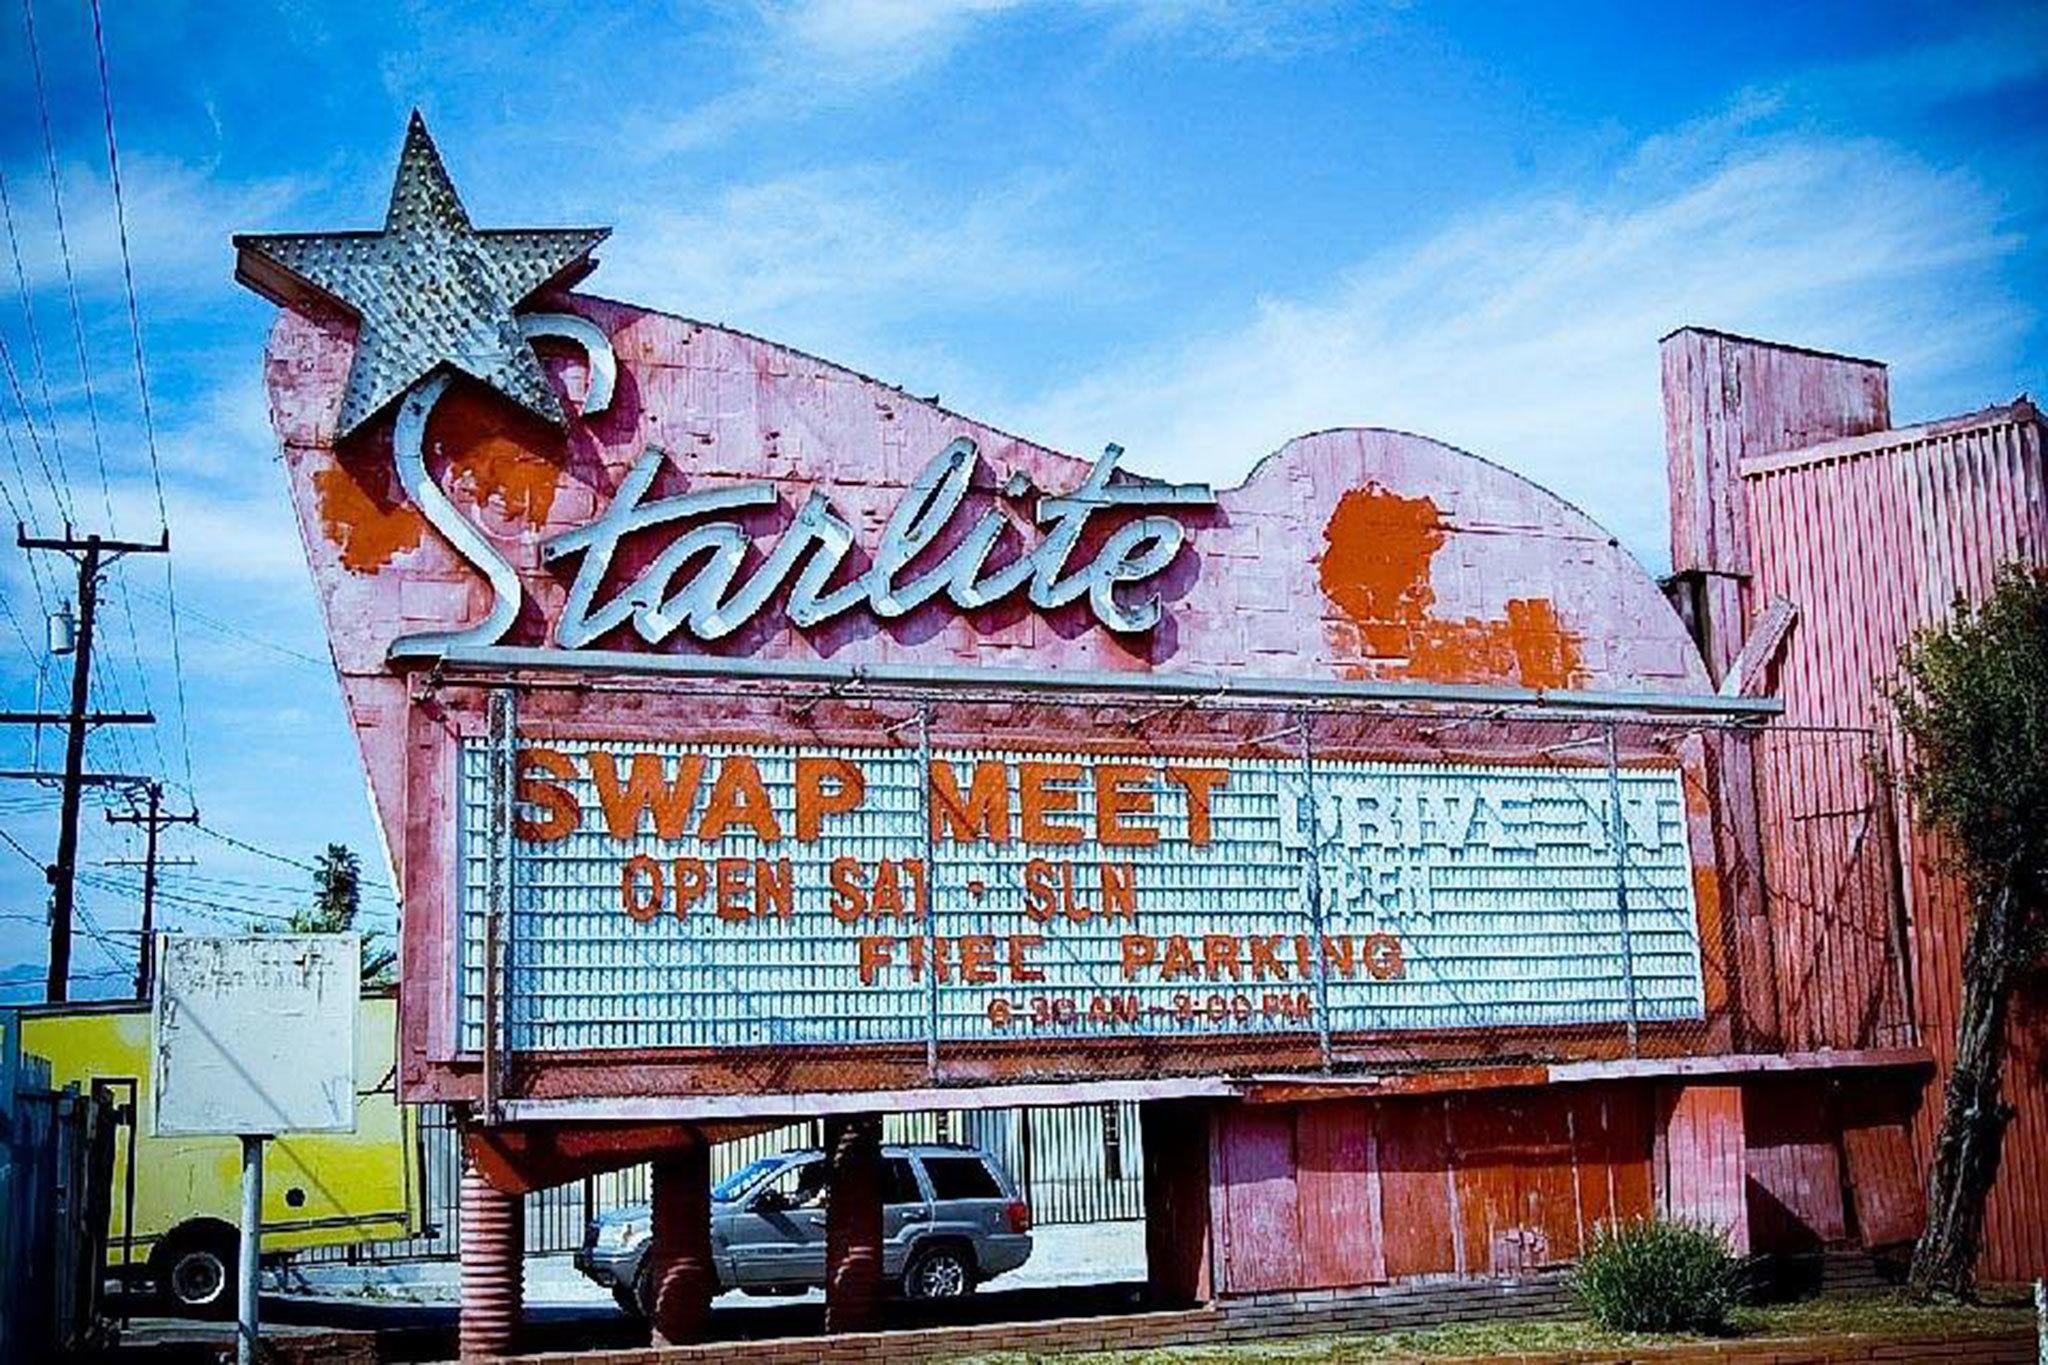 Blue Starlite Mini Urban Drive-In